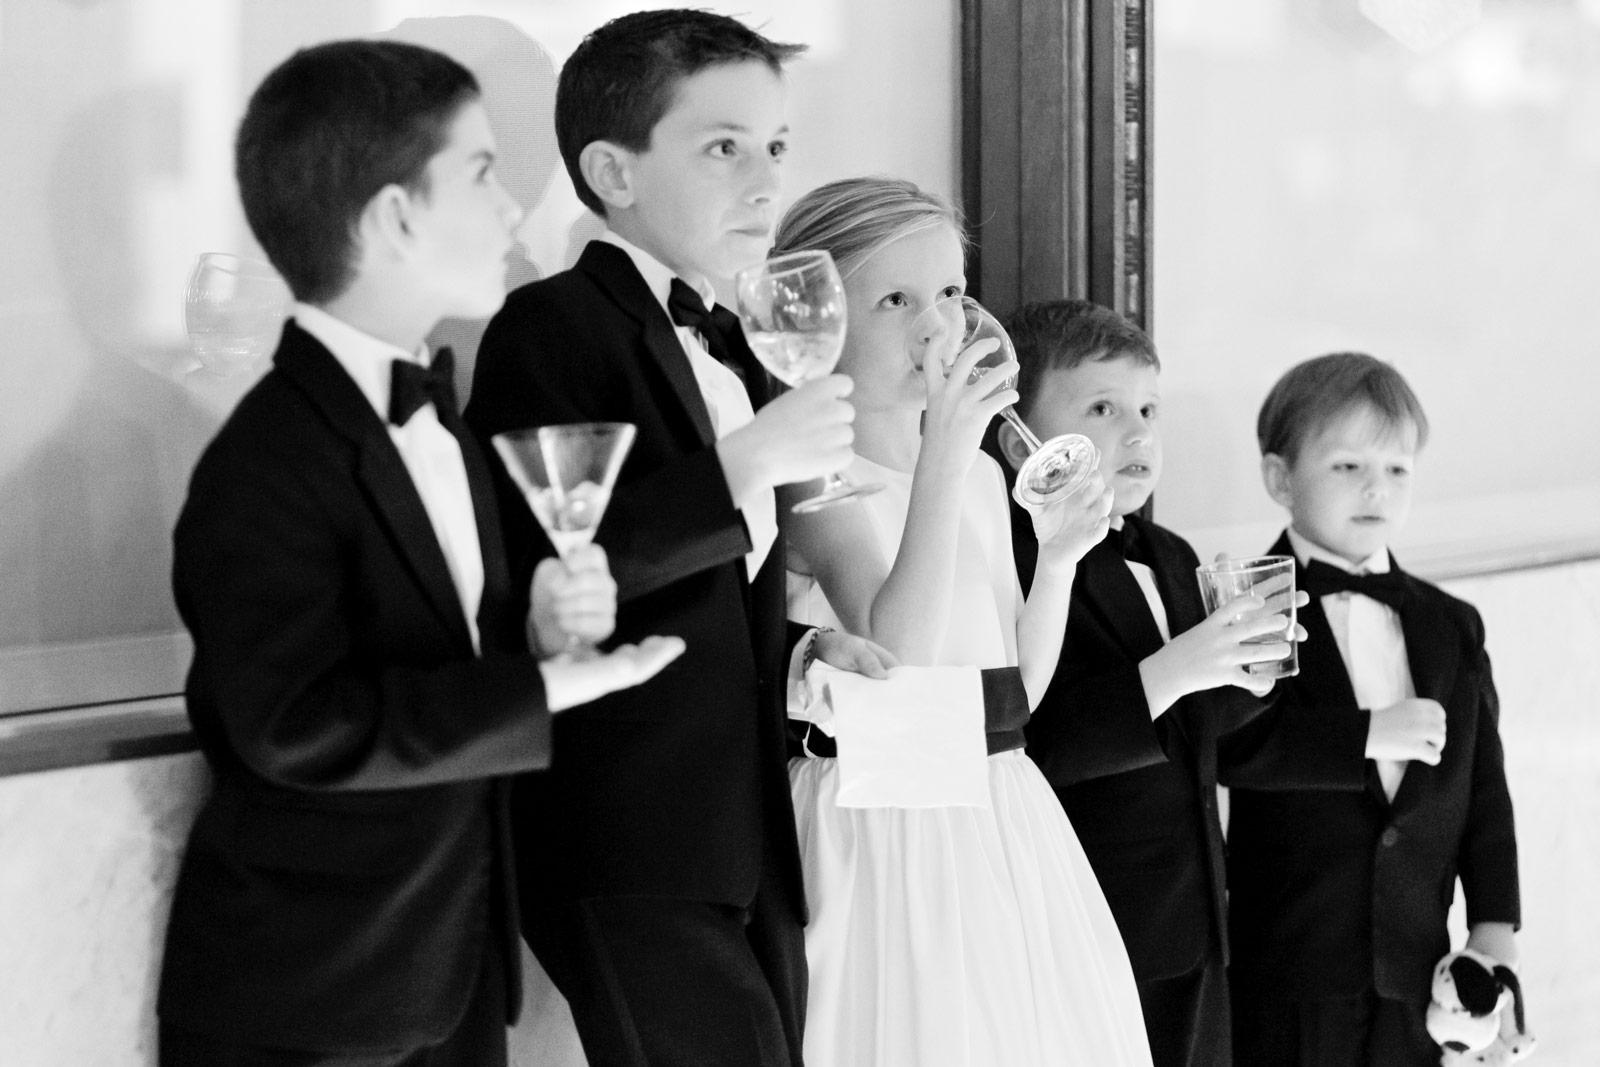 rookery-chicago-wedding-ruthie-hauge-photography-journalistic.jpg